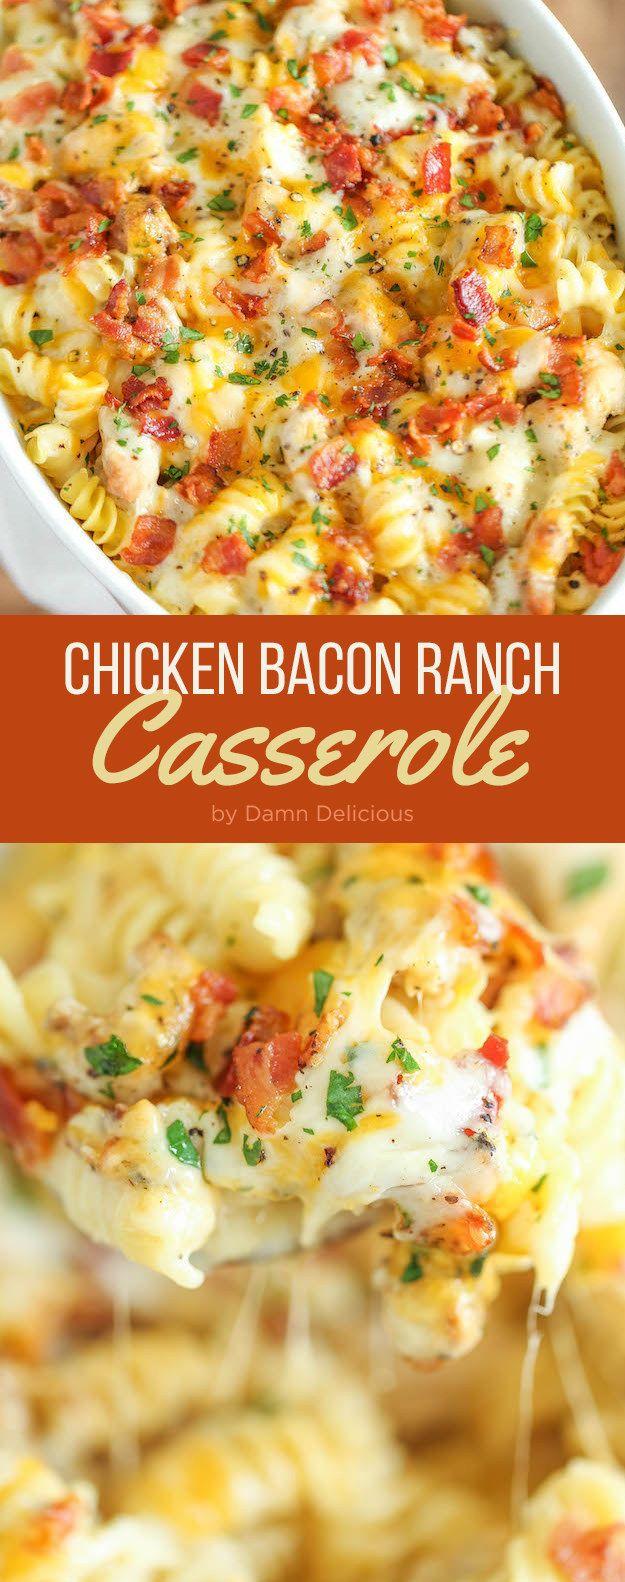 Including a creamy chicken ranch casserole and the best steak fajitas.